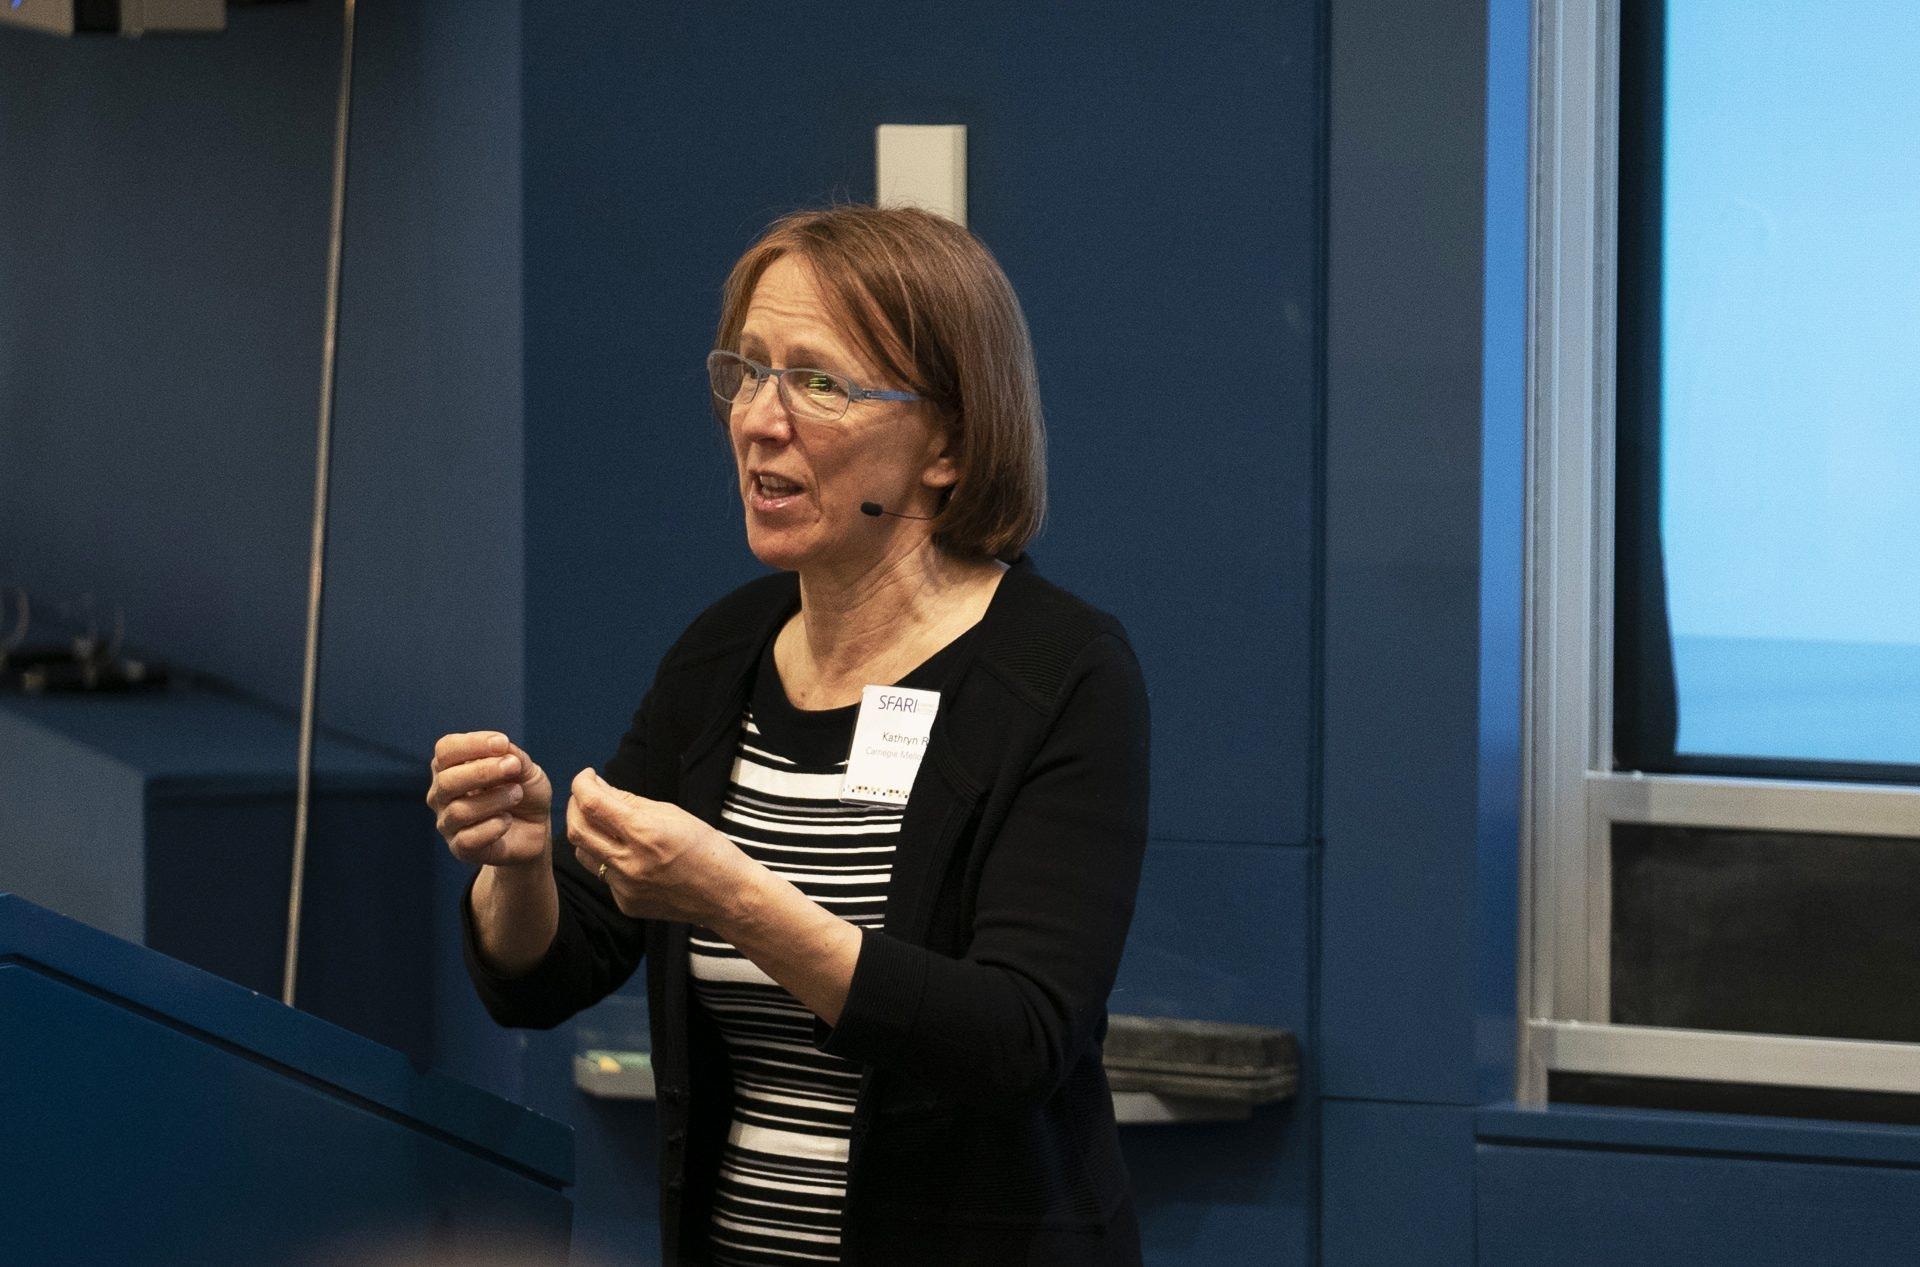 Image of Kathryn Roeder giving a presentation.